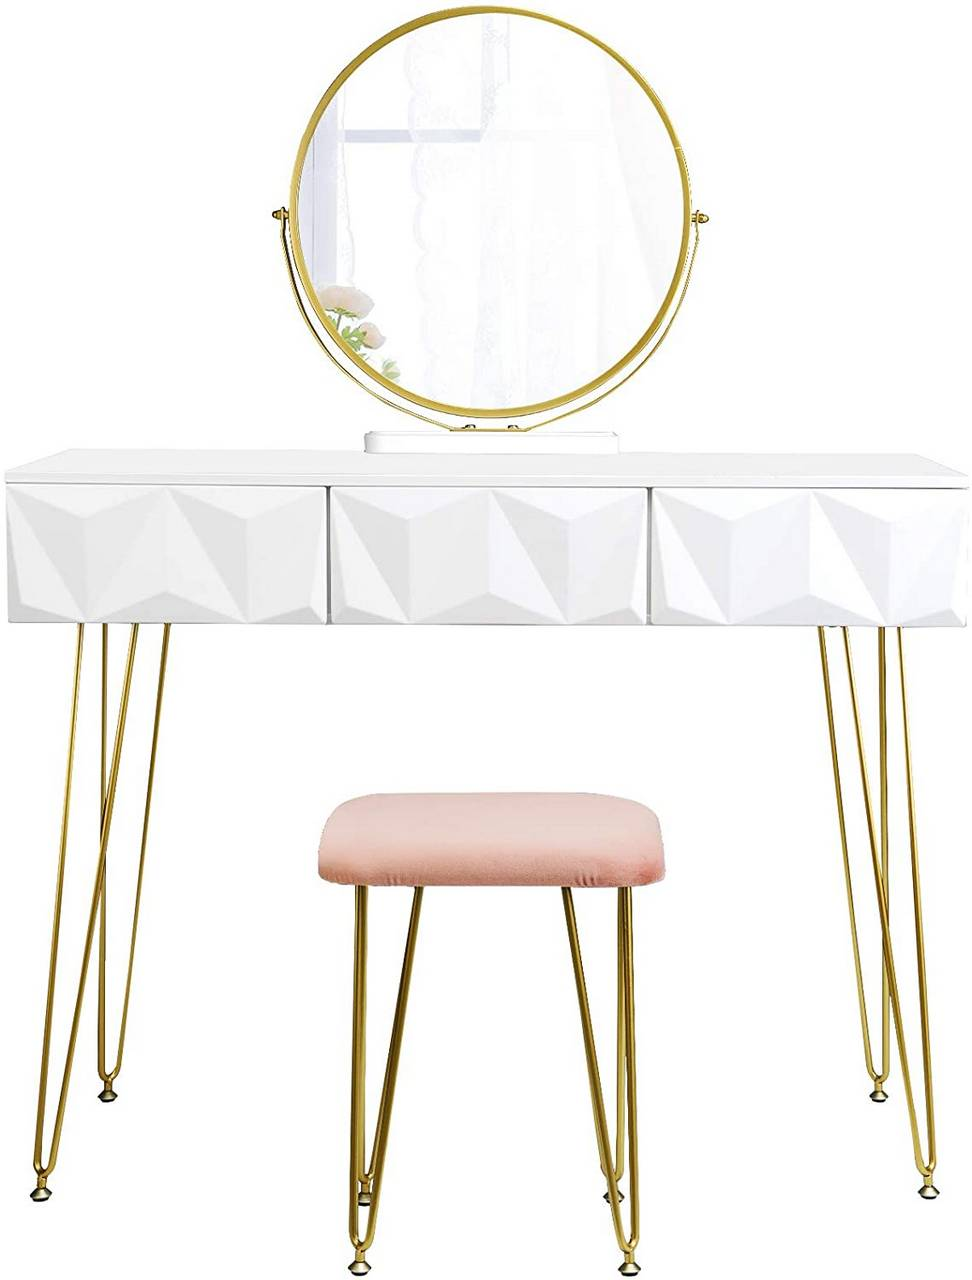 Designer Schminktisch Hocker Schwenkbarer Spiegel 3d Schublade Gold Woltu Eu